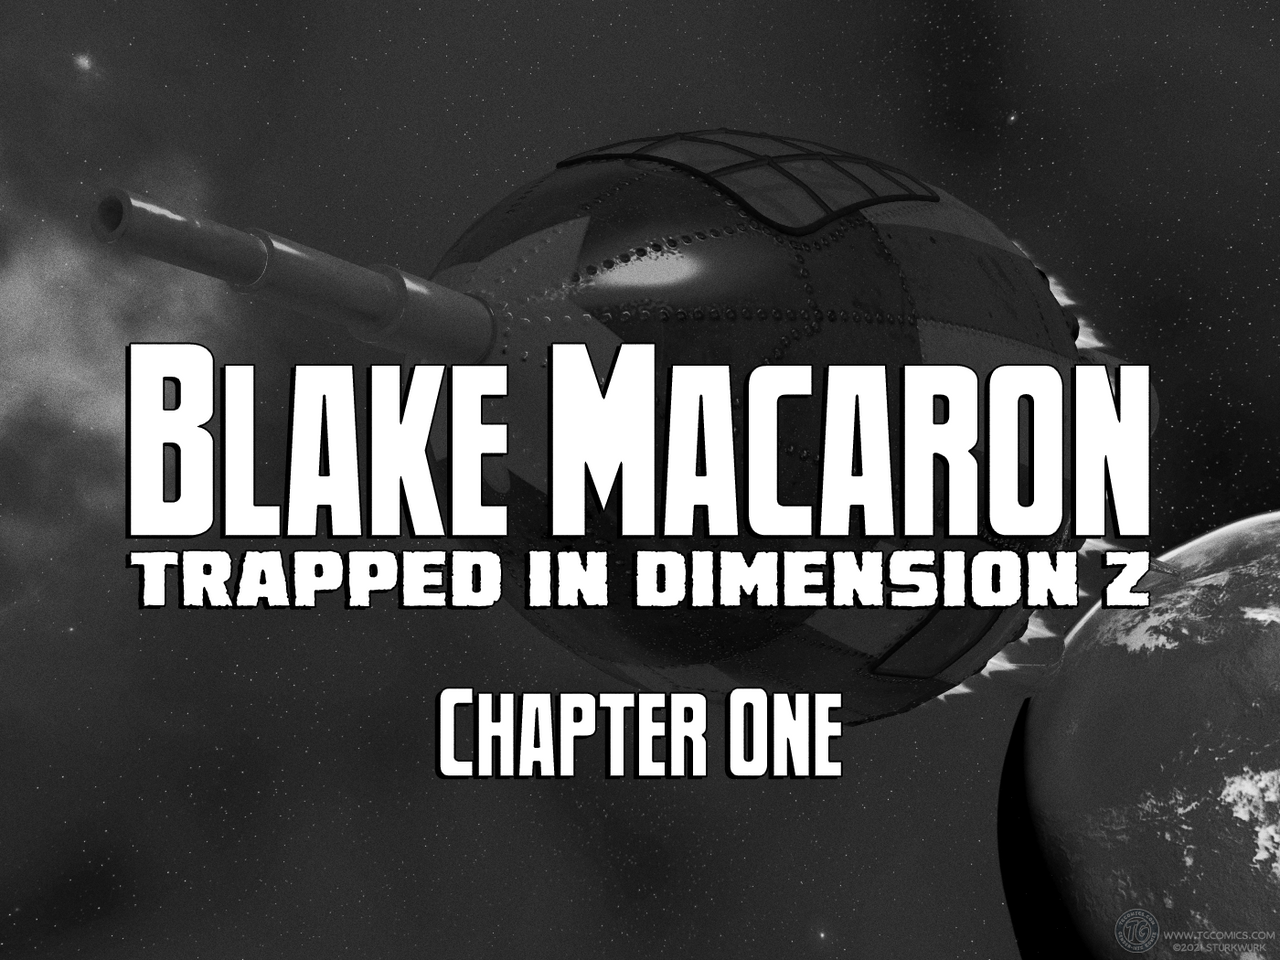 Blake Macaron: Trapped in Dimension Z